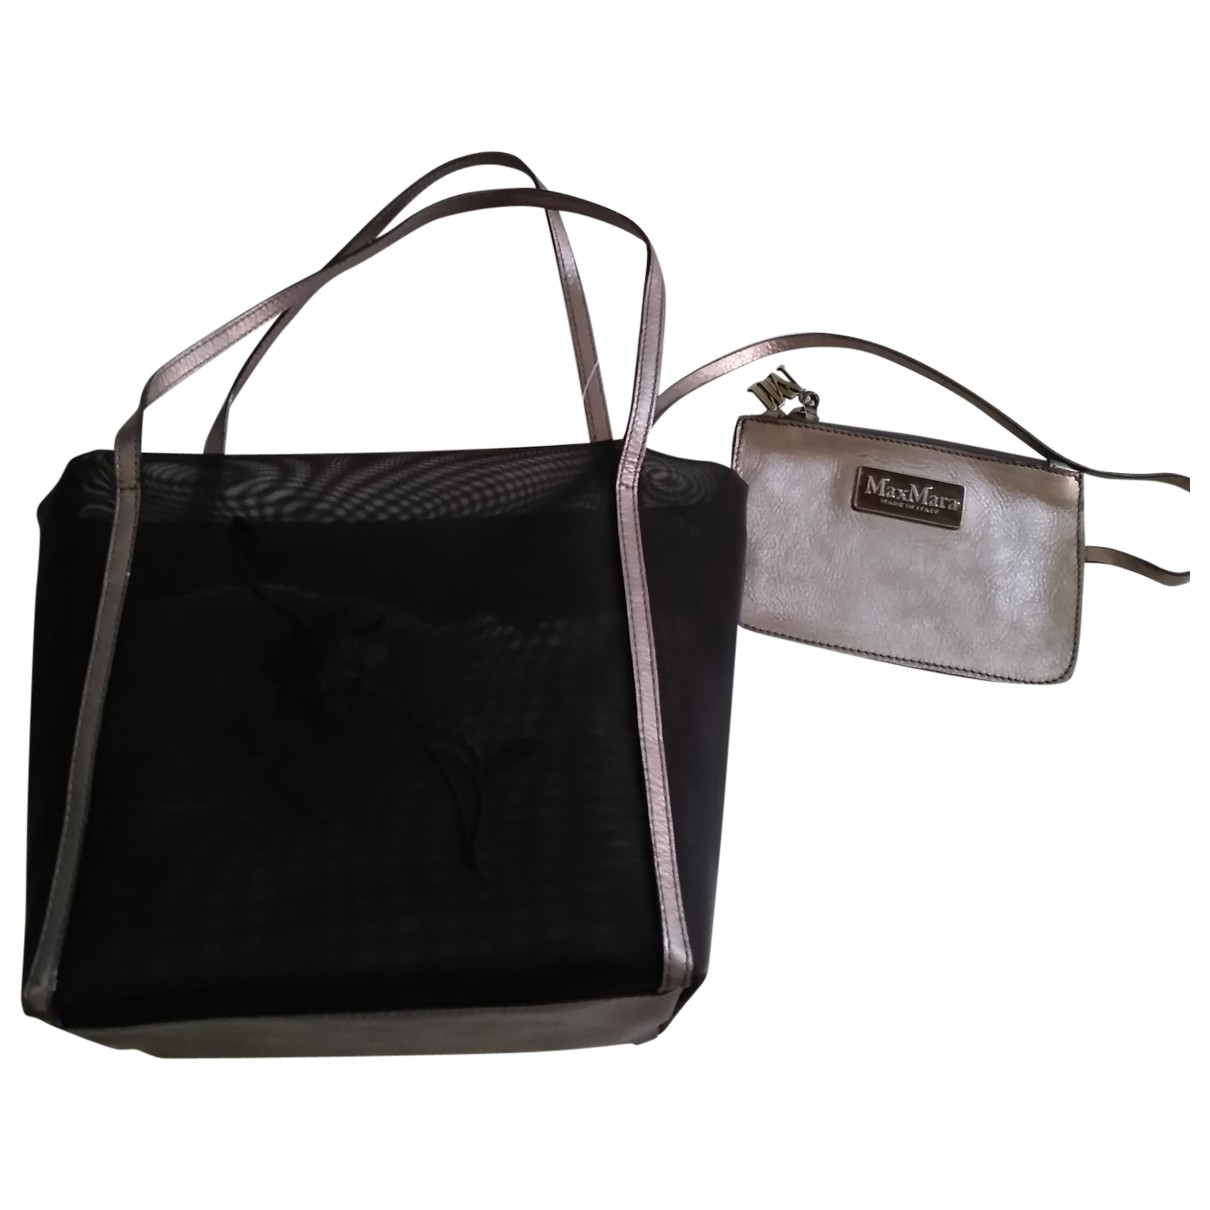 Max Mara \N Black handbag for Women \N